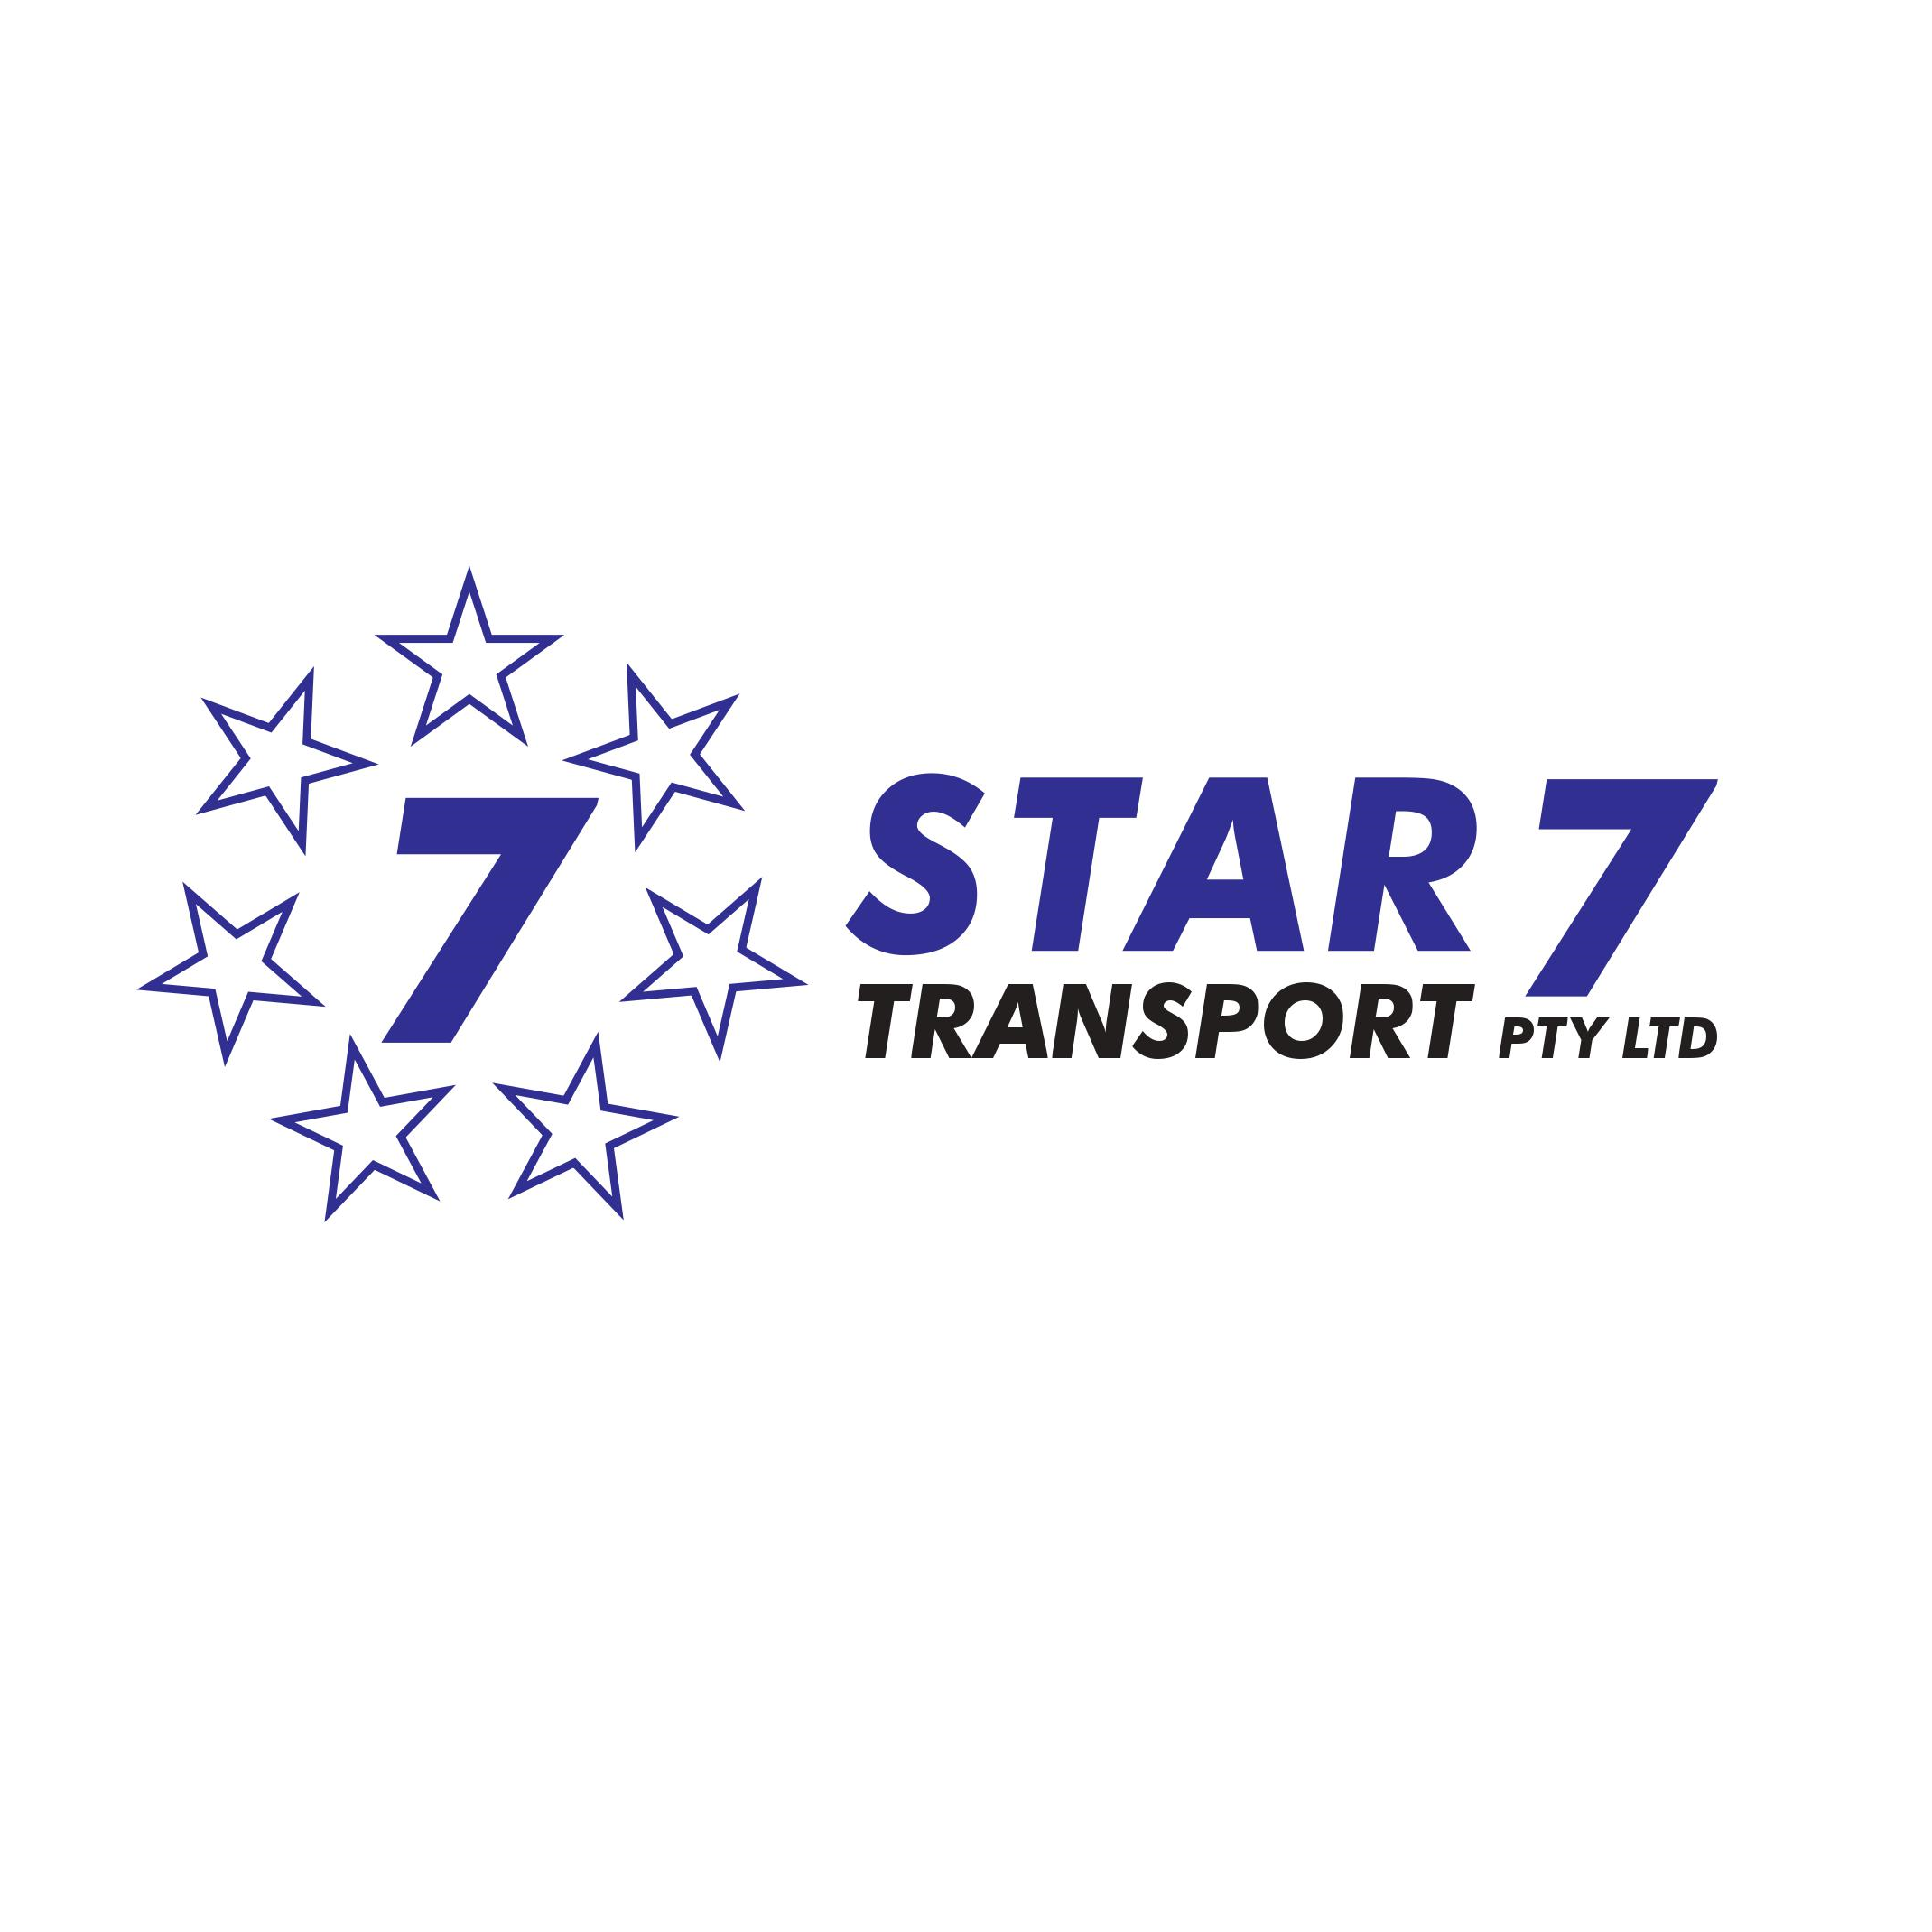 Star7 Transport